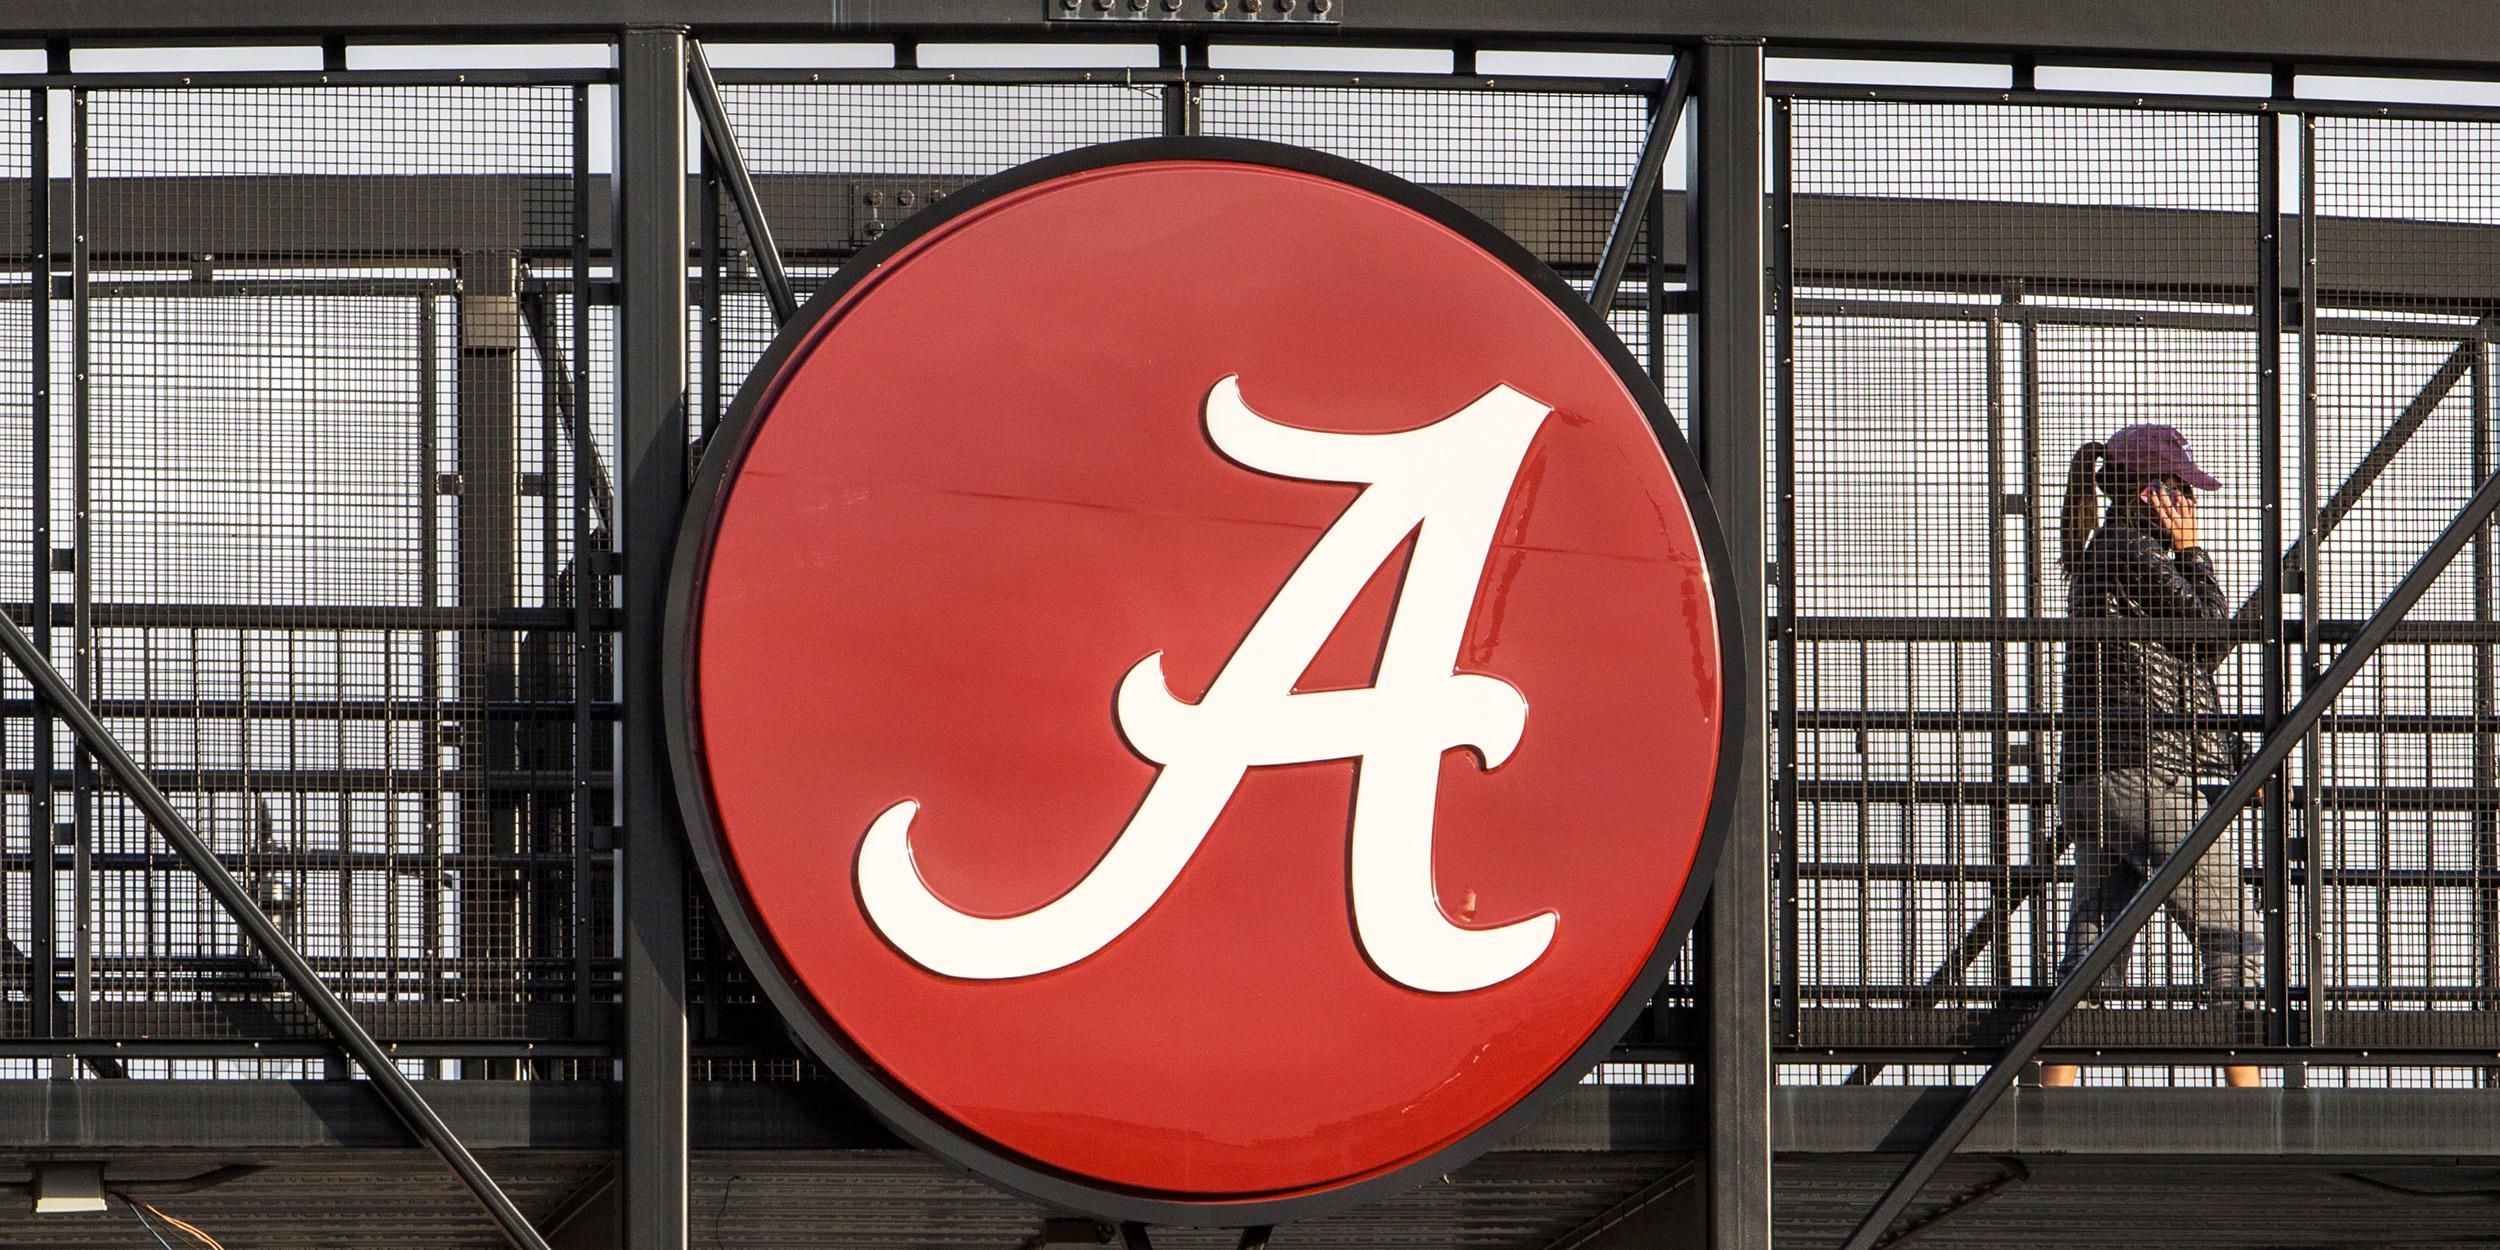 University of Alabama sorority rush has taken over TikTok